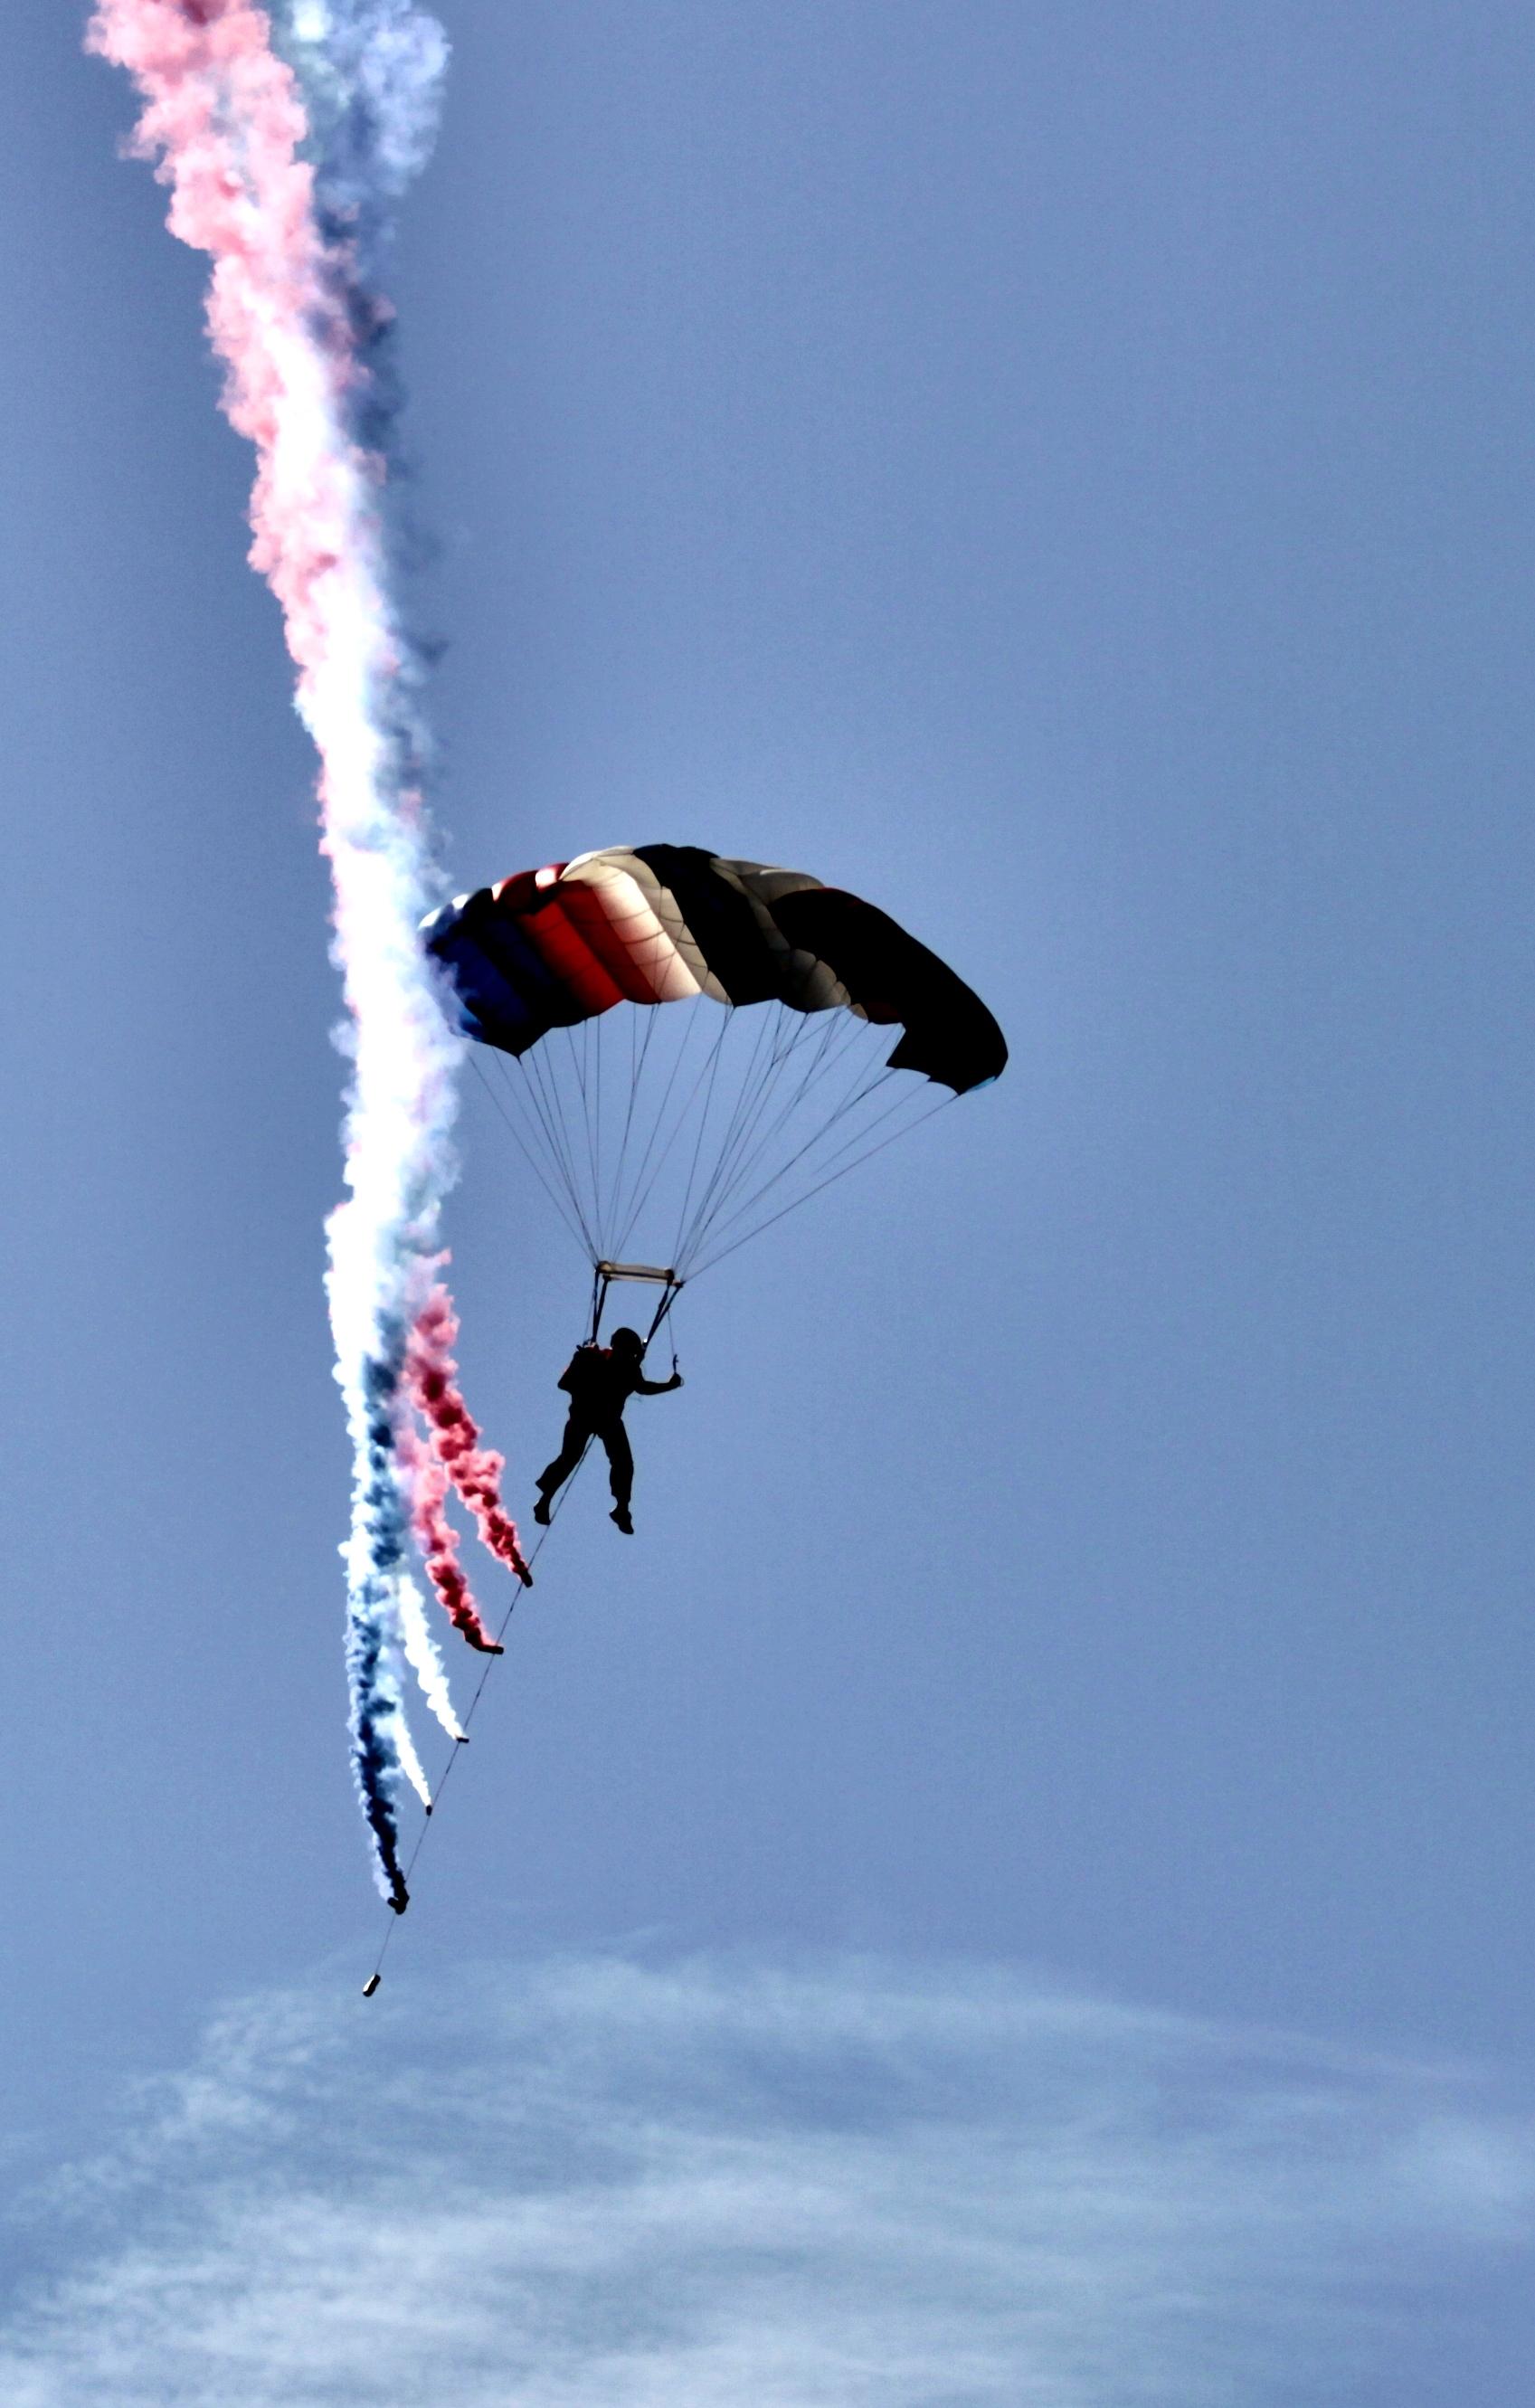 Flag jump skydiver